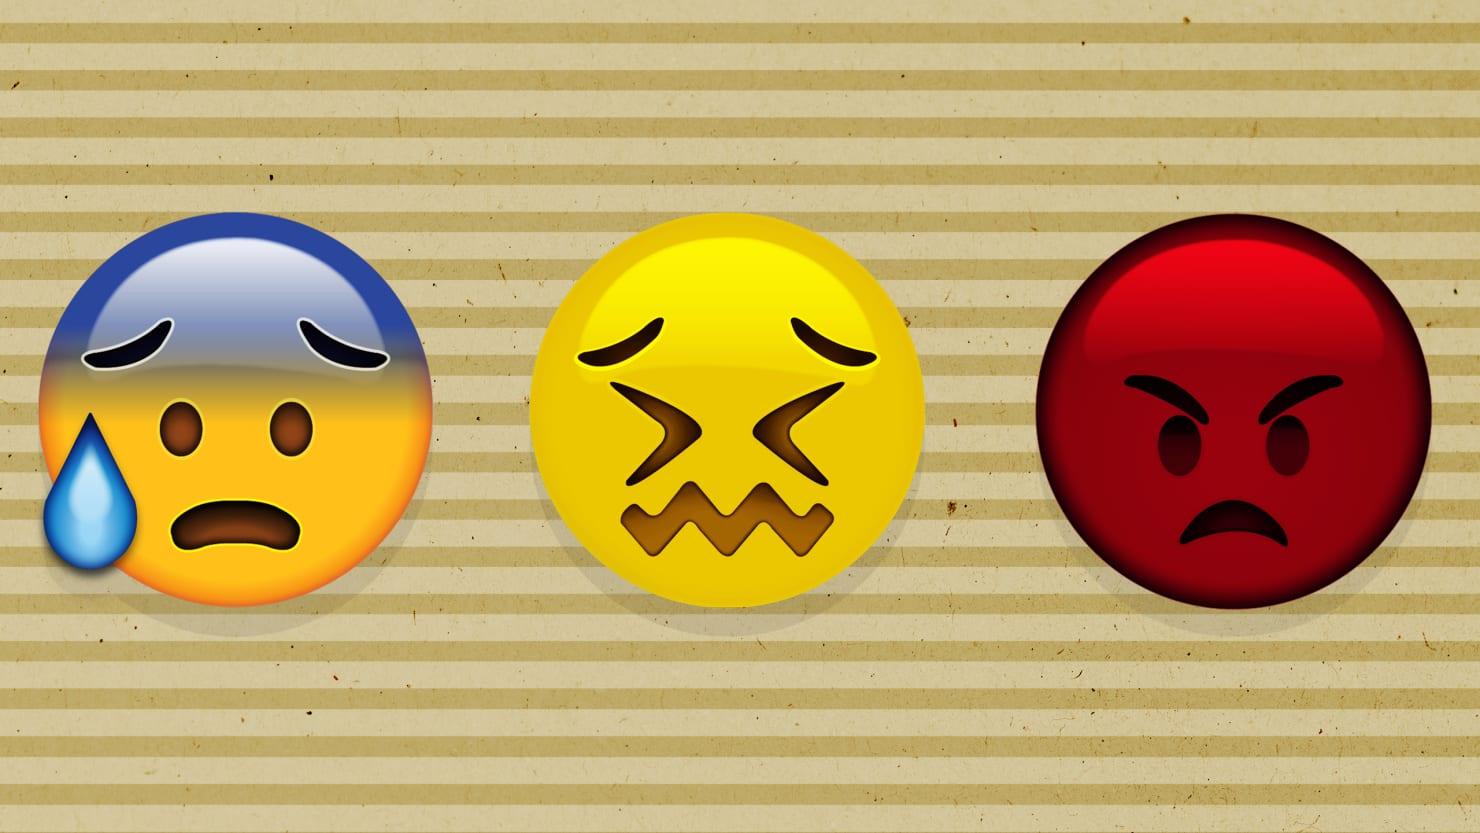 disgust emoji homophobia incest gross yuck debra lieberman